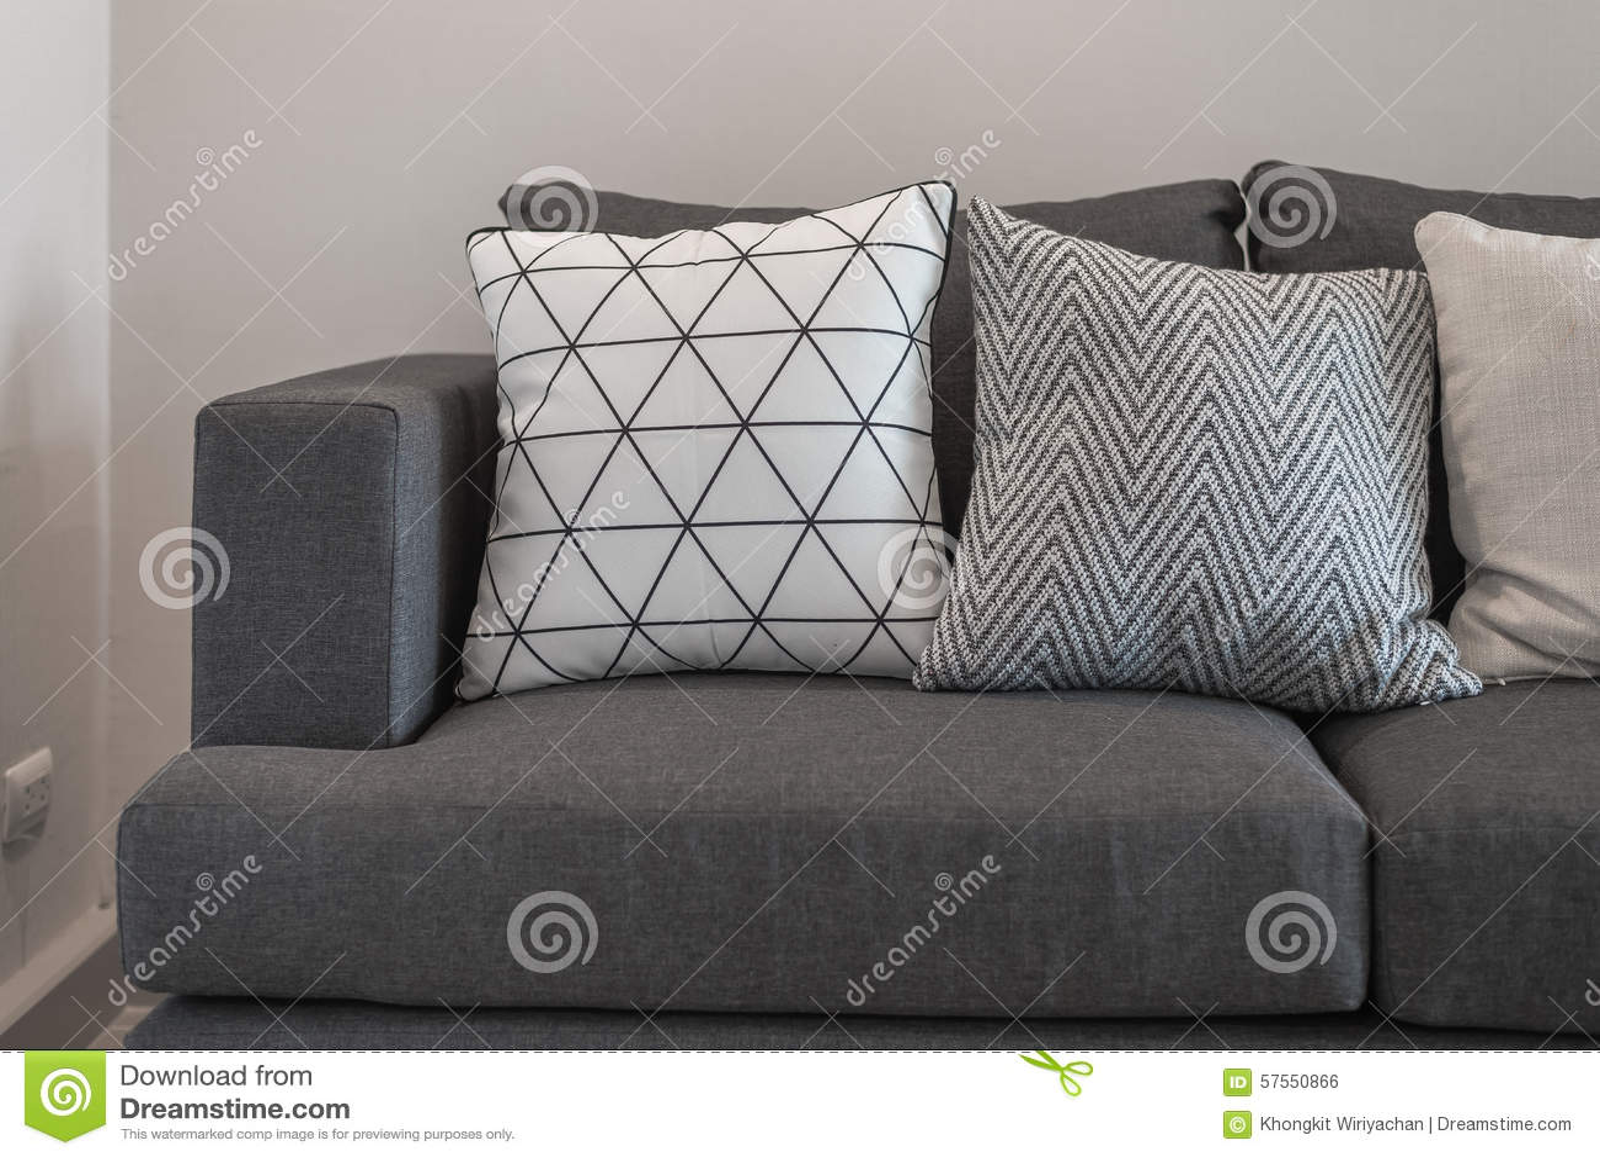 Graphic Pattern Pillows On Modern Grey Sofa